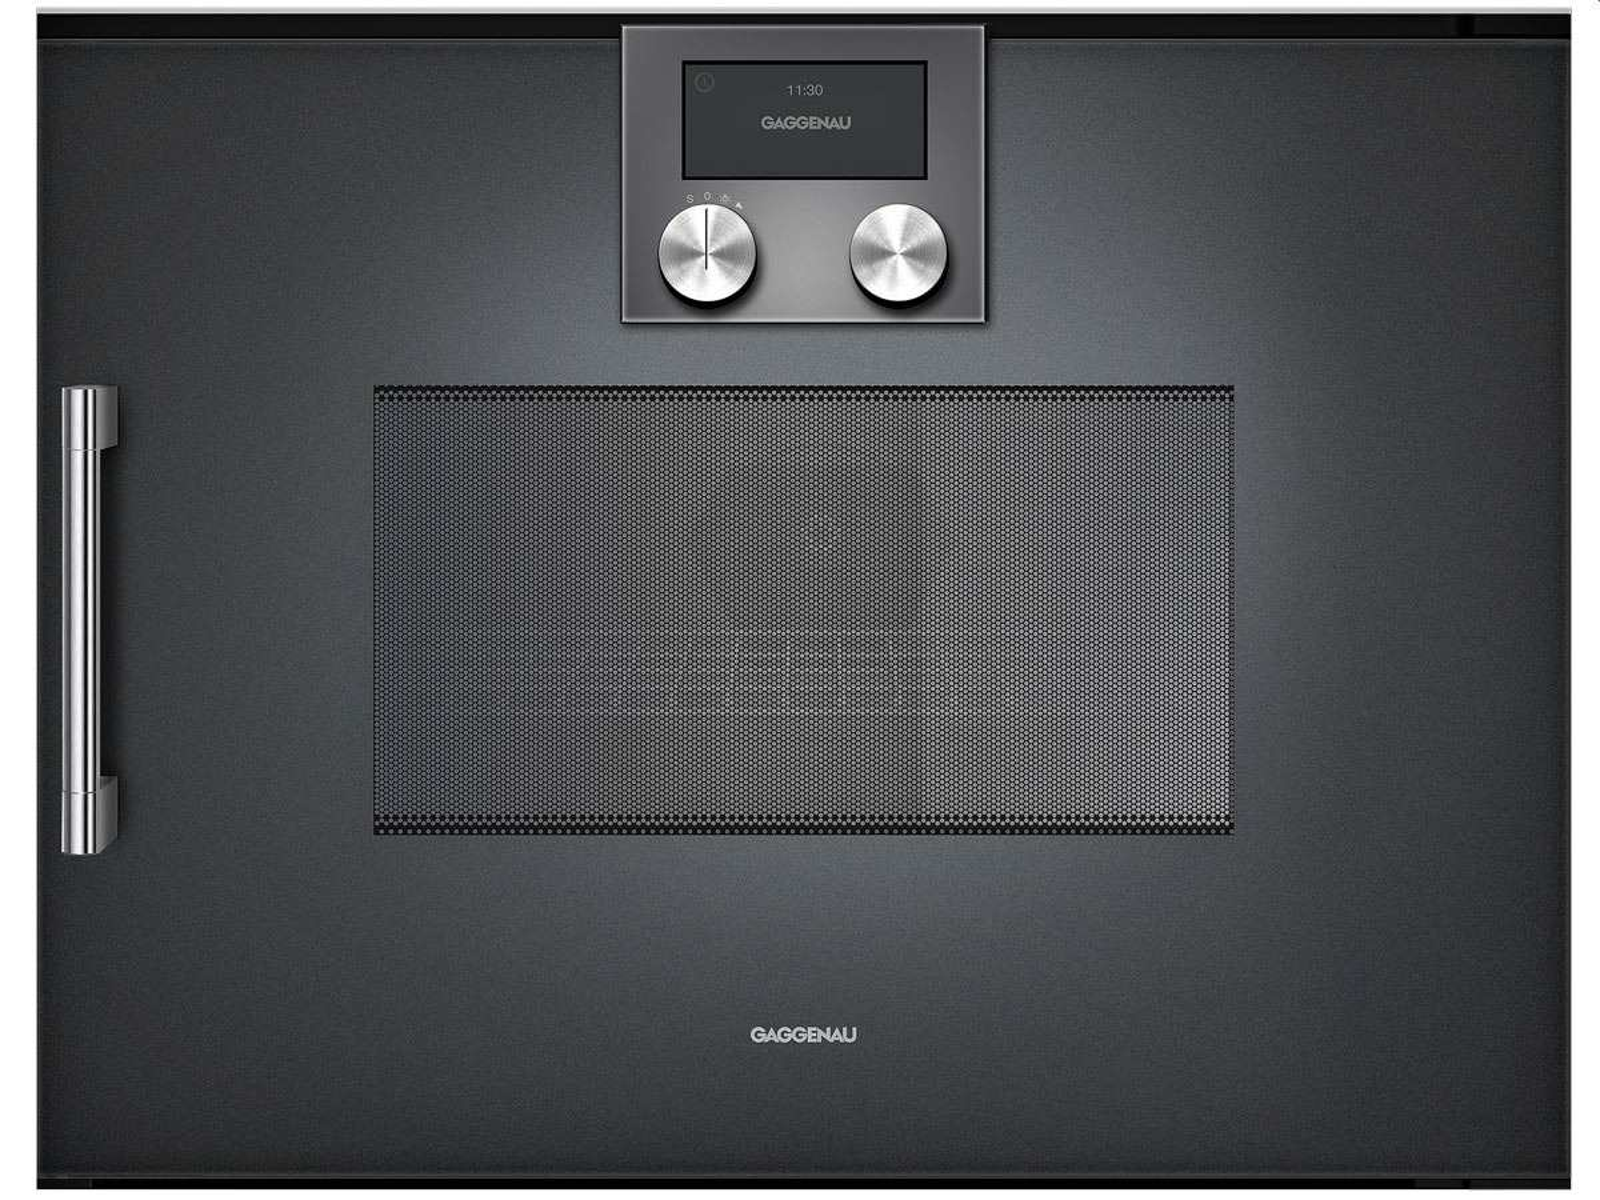 gaggenau bmp 250 100 mikrowellen backofen serie 200 anthrazit. Black Bedroom Furniture Sets. Home Design Ideas